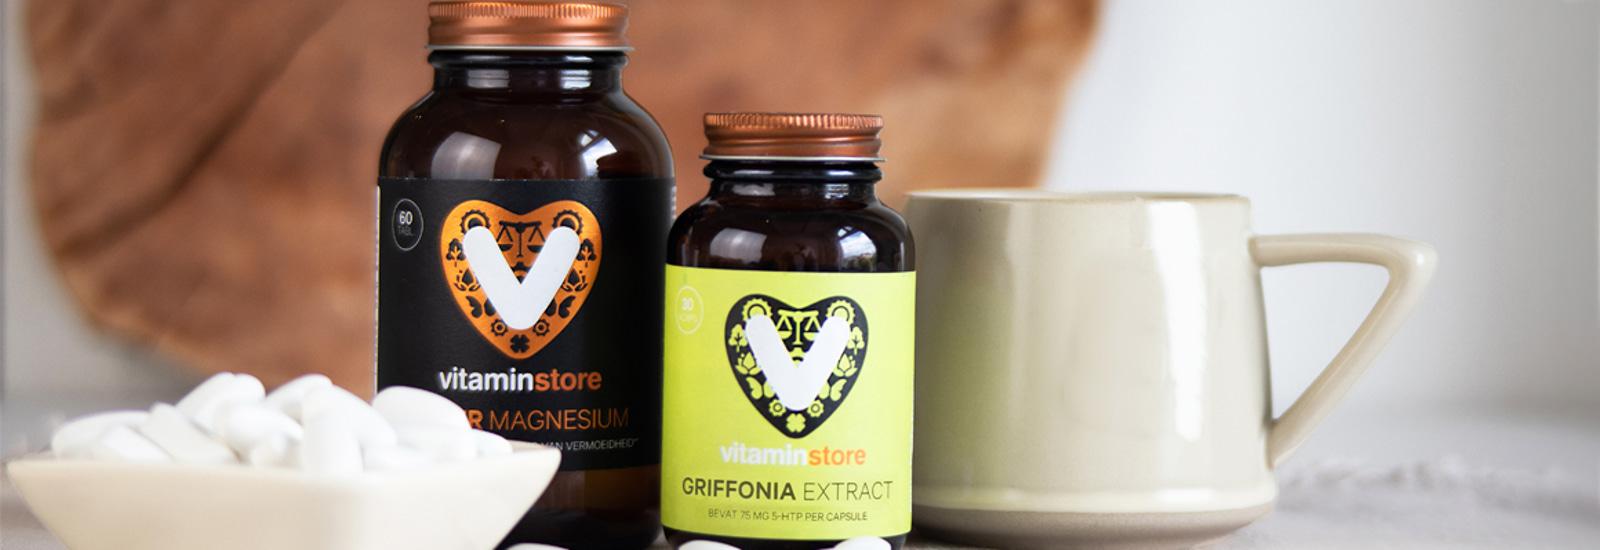 slaap-voeding-magnesium-vitaminstore